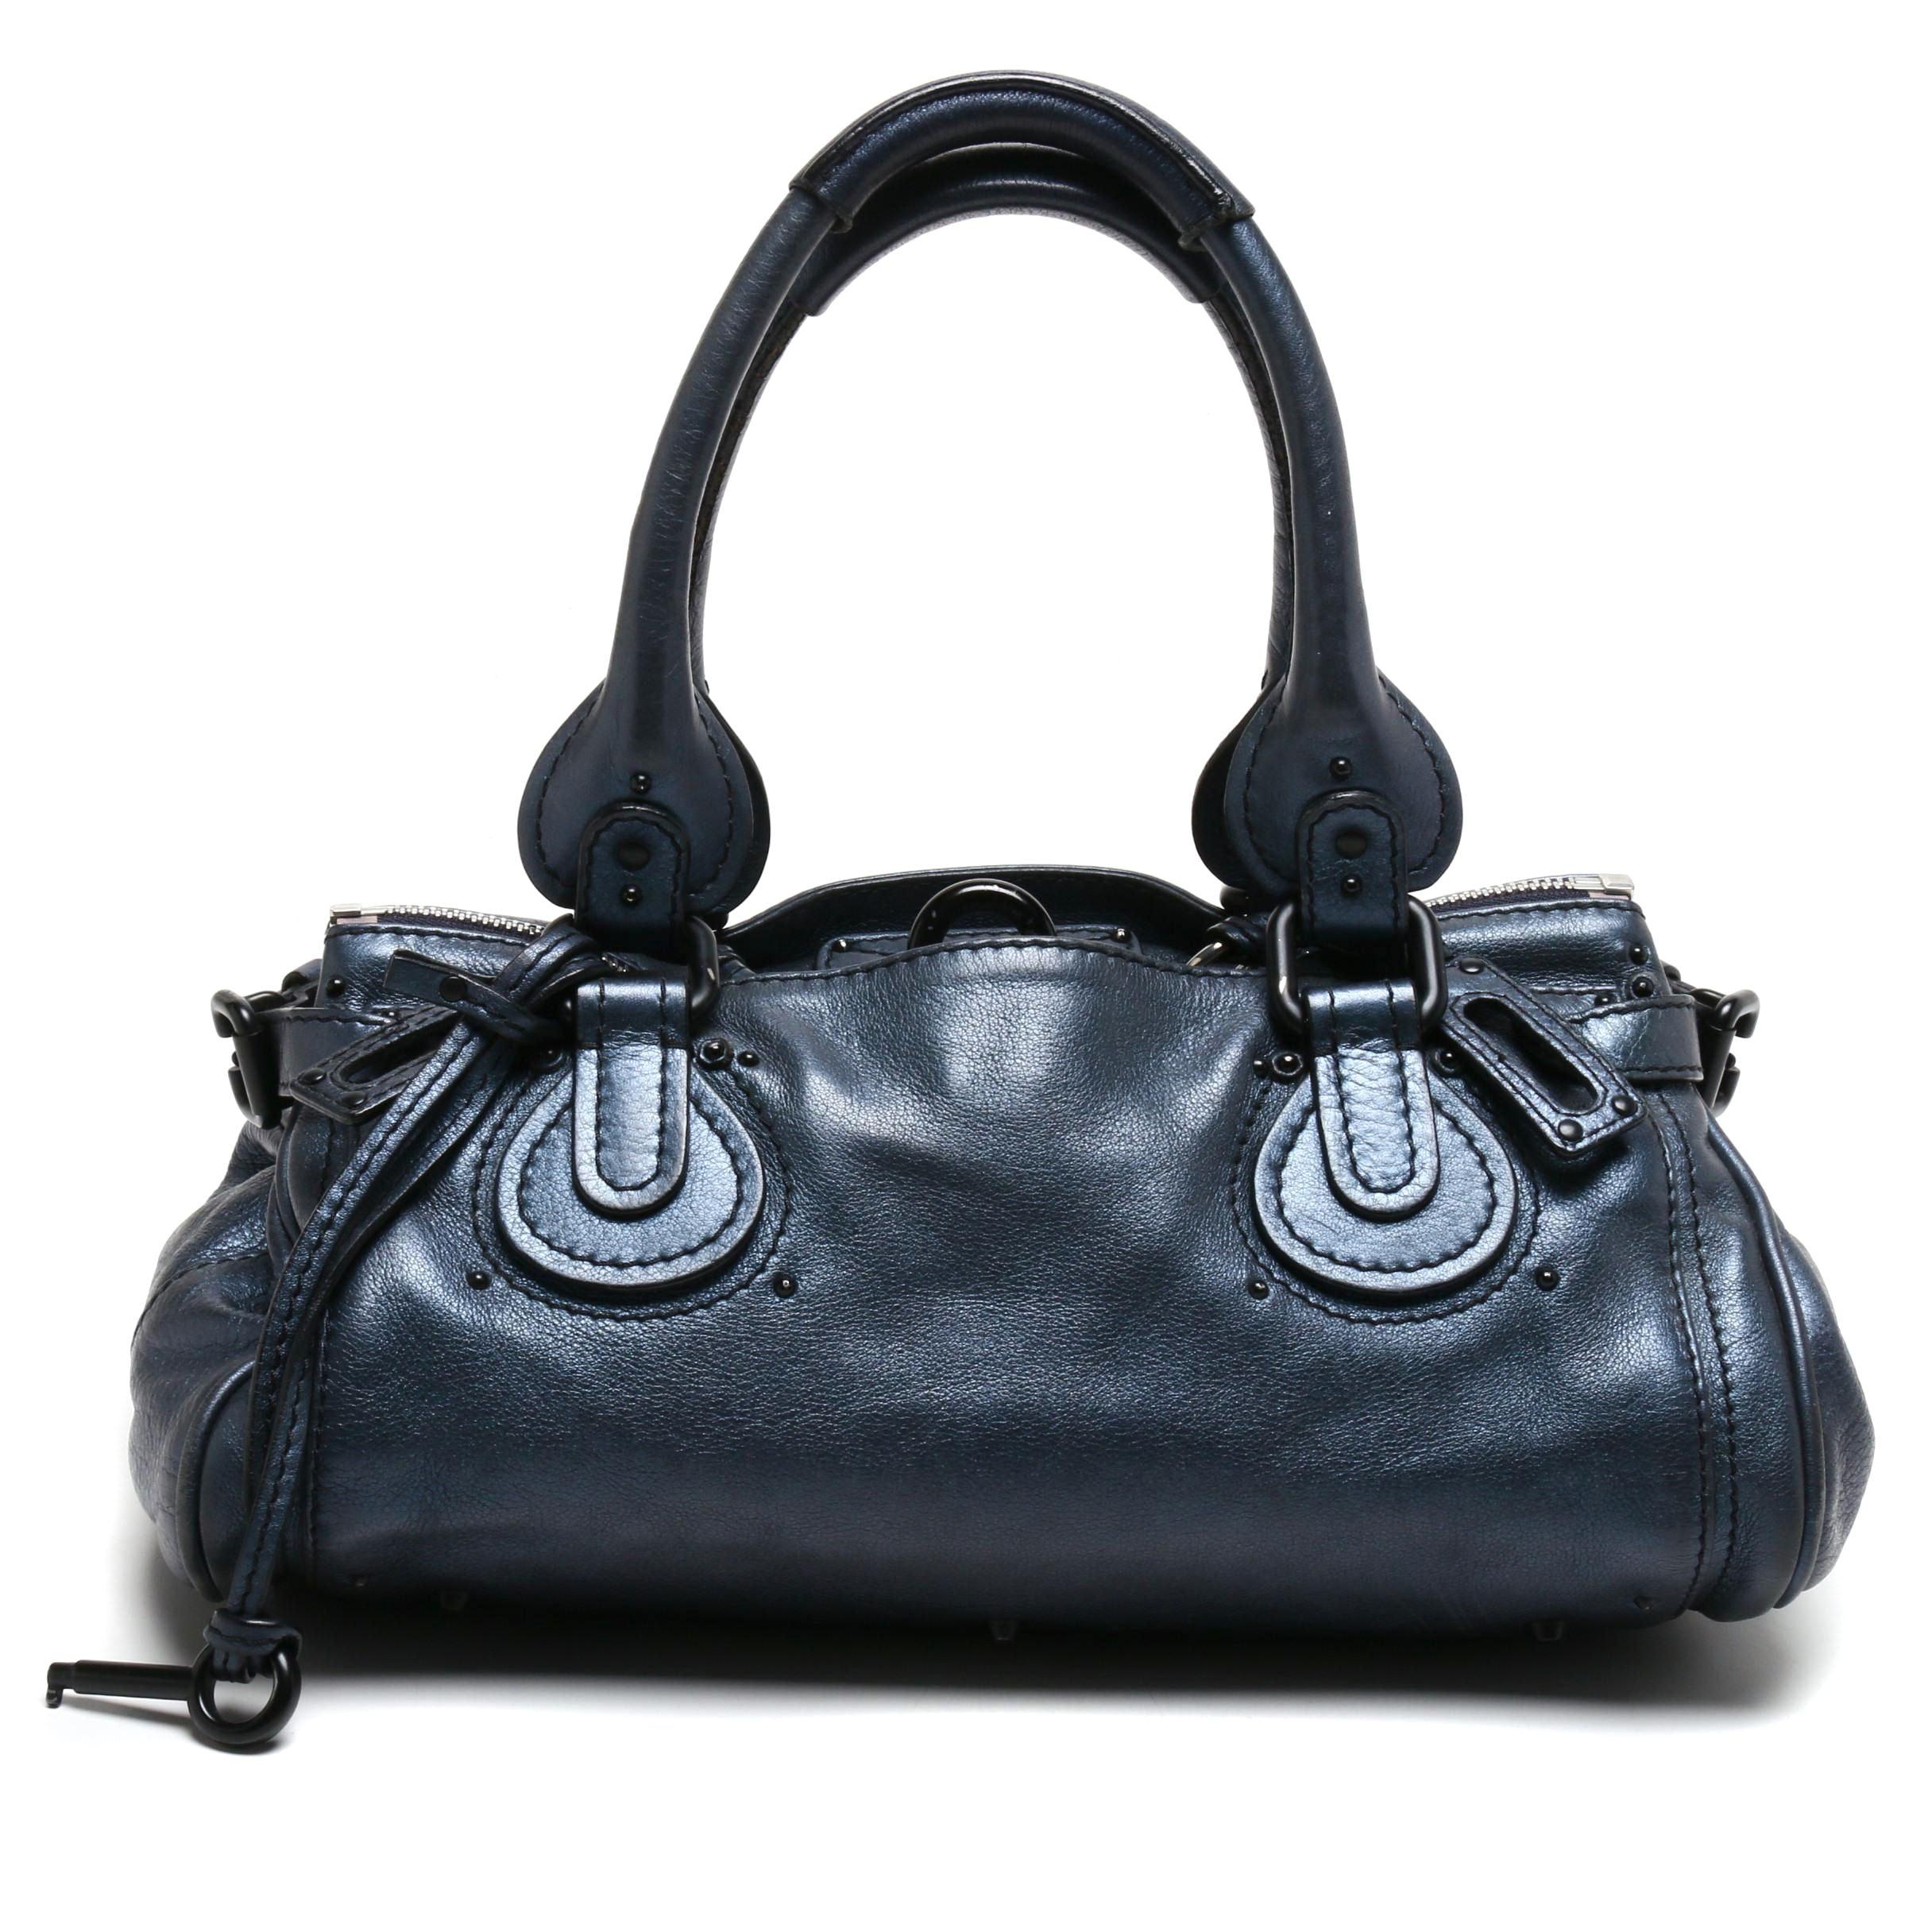 Chloé Metallic Blue Leather Paddington Satchel